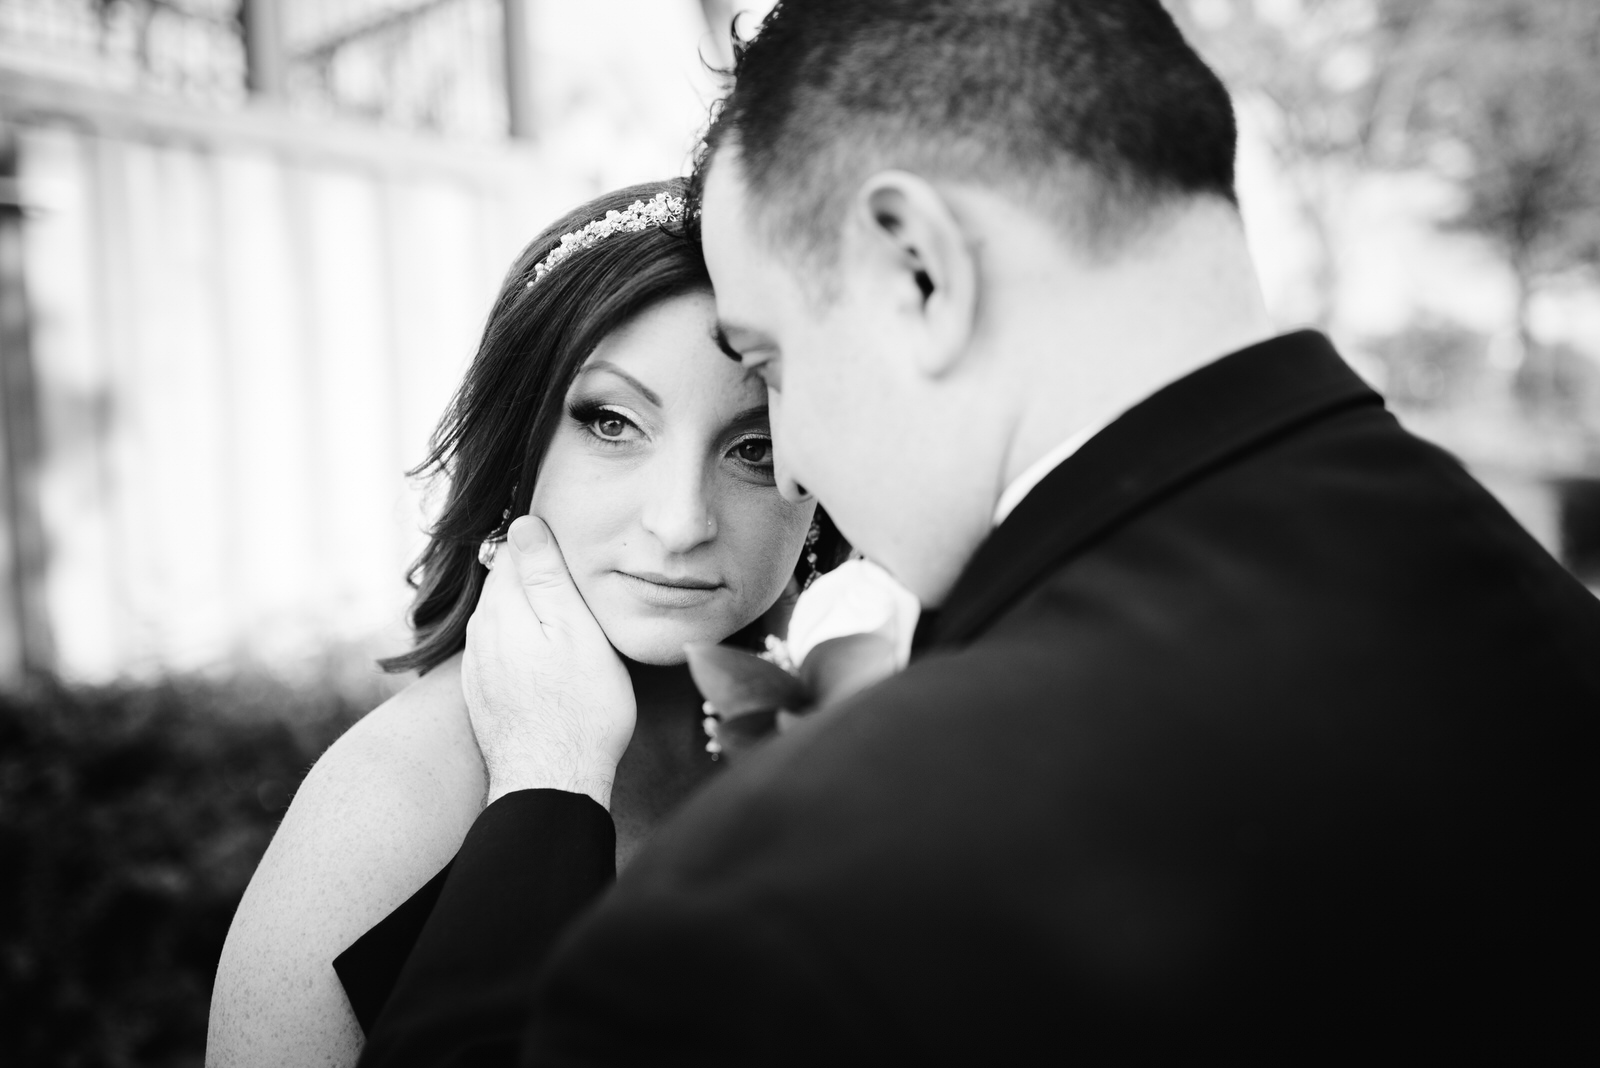 Laube_Banquet_Hall__Wedding_Photos_016.jpg